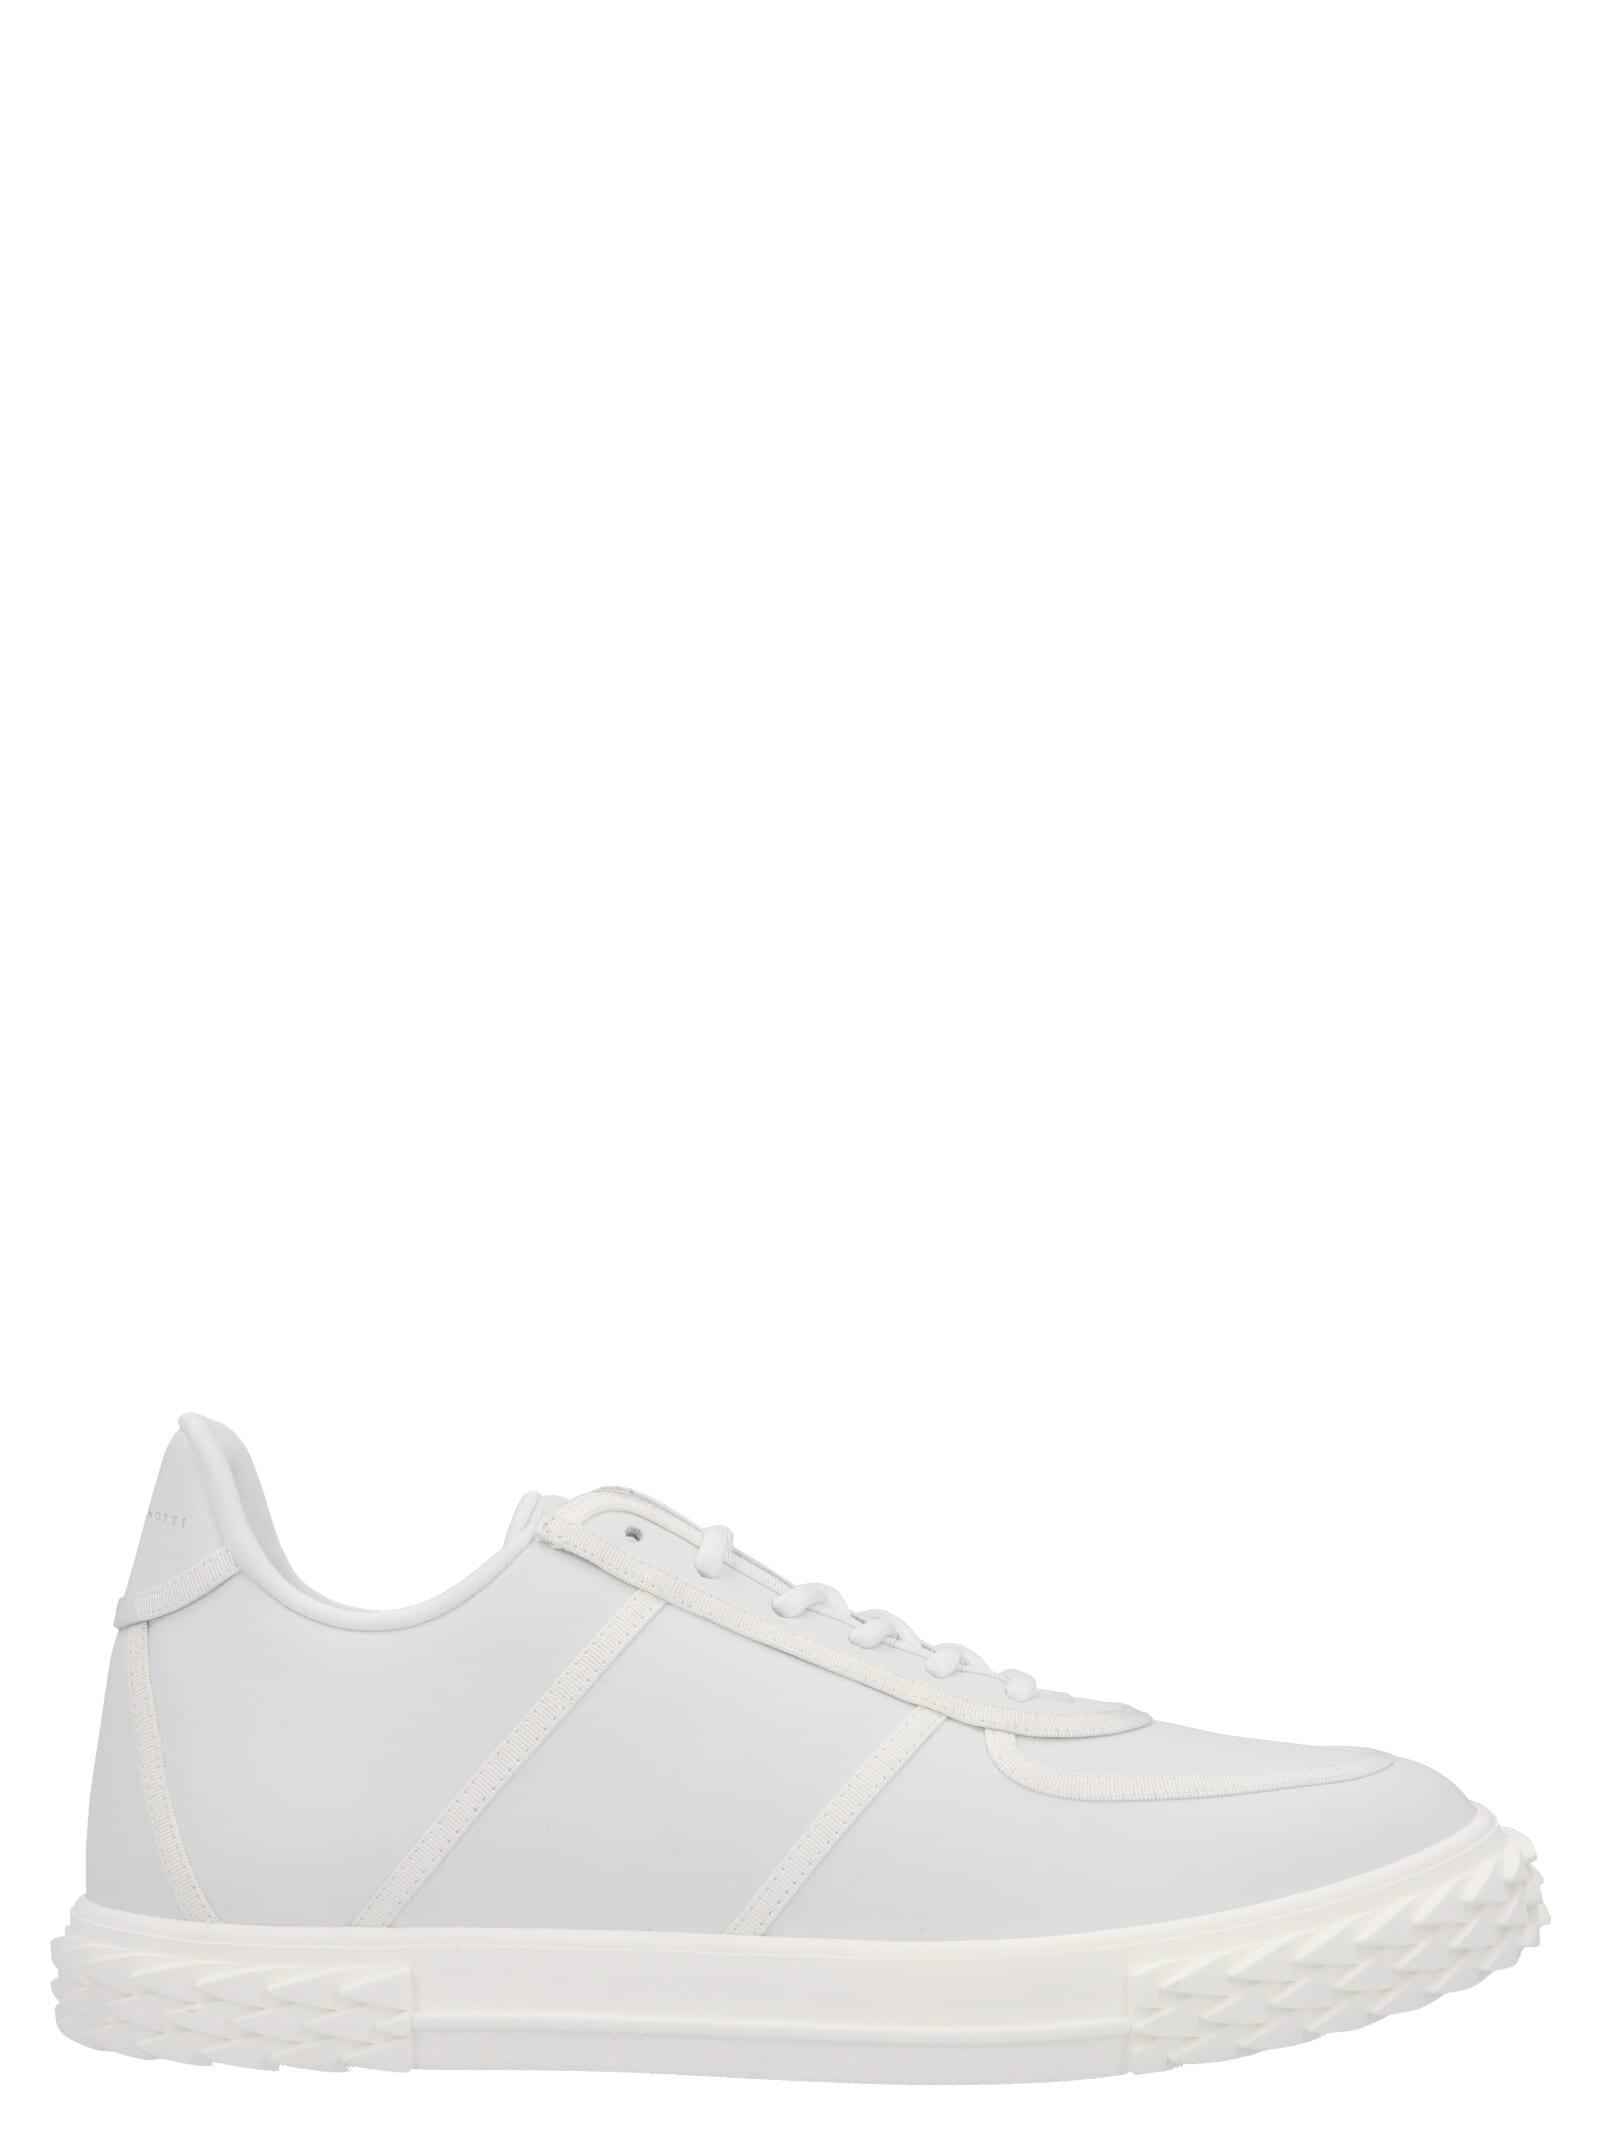 Giuseppe Zanotti new Blabbet Shoes